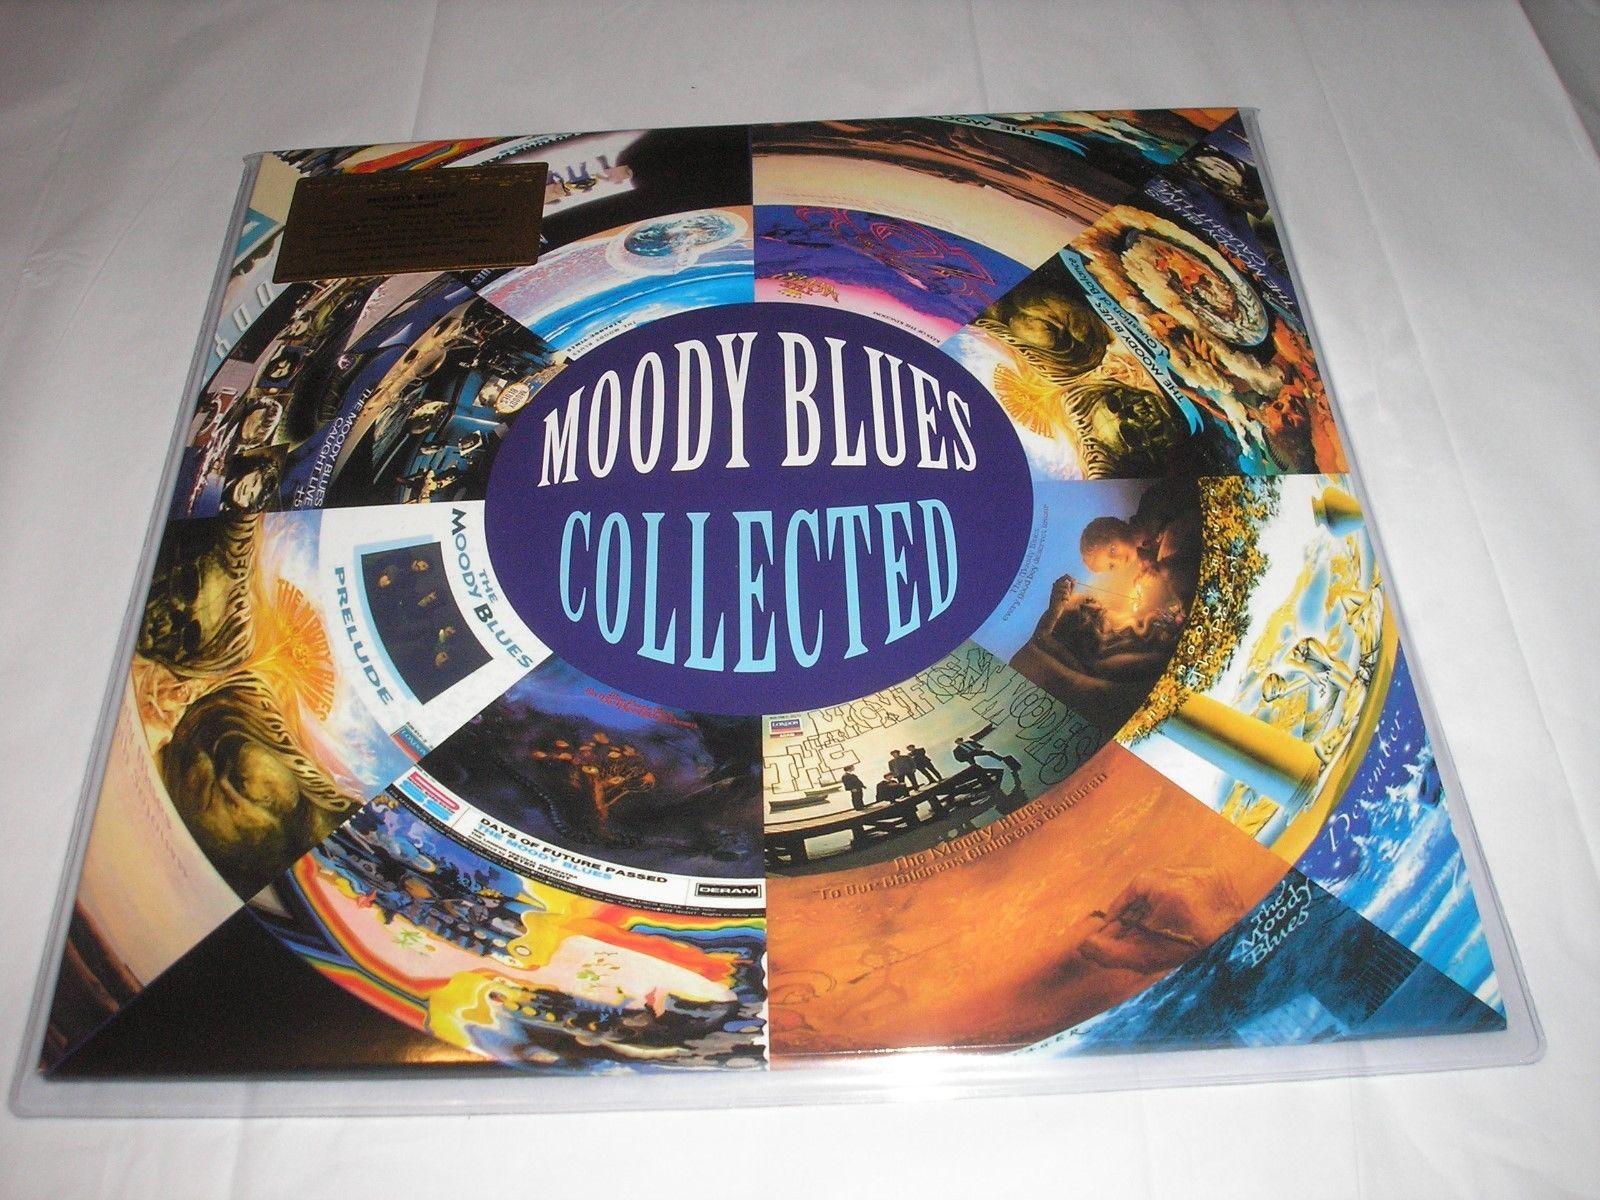 The Moody Blues Collected 2 Lp 180 Gram Purple Vinyl Ltd Numbered Ed New Sealed Moody Blues Vinyl Sales Vinyl Music